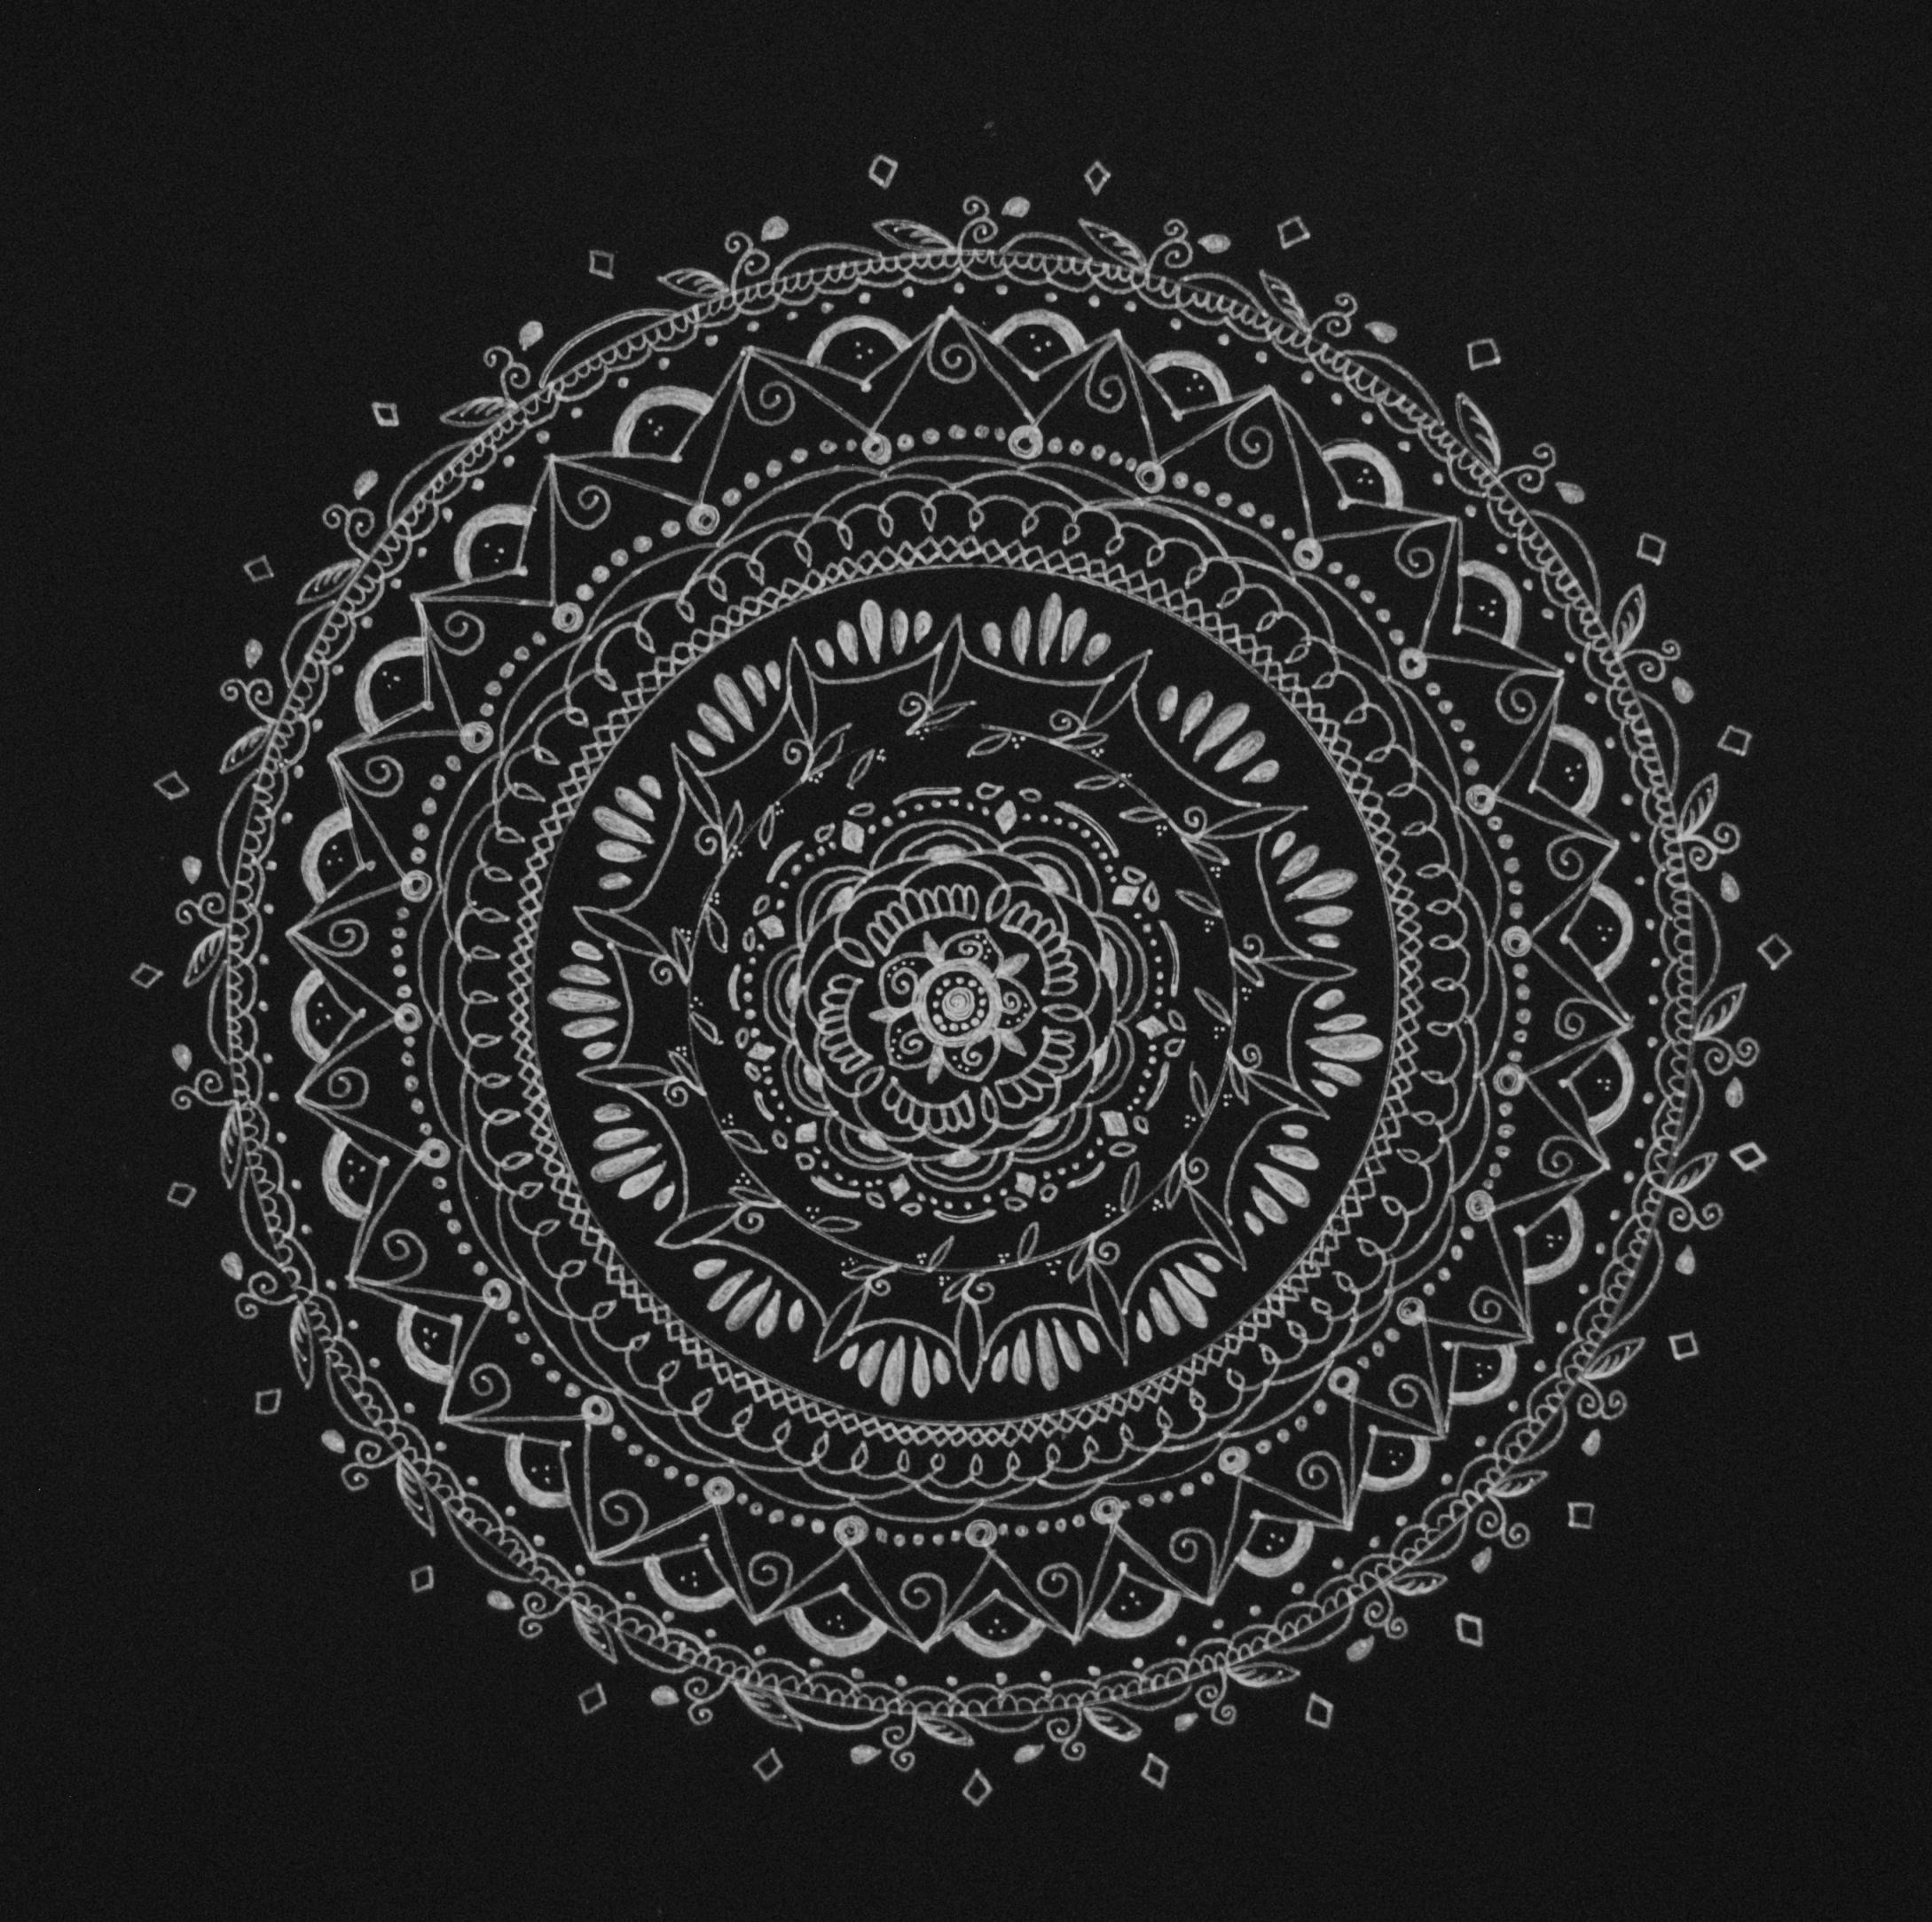 Untitled Circle